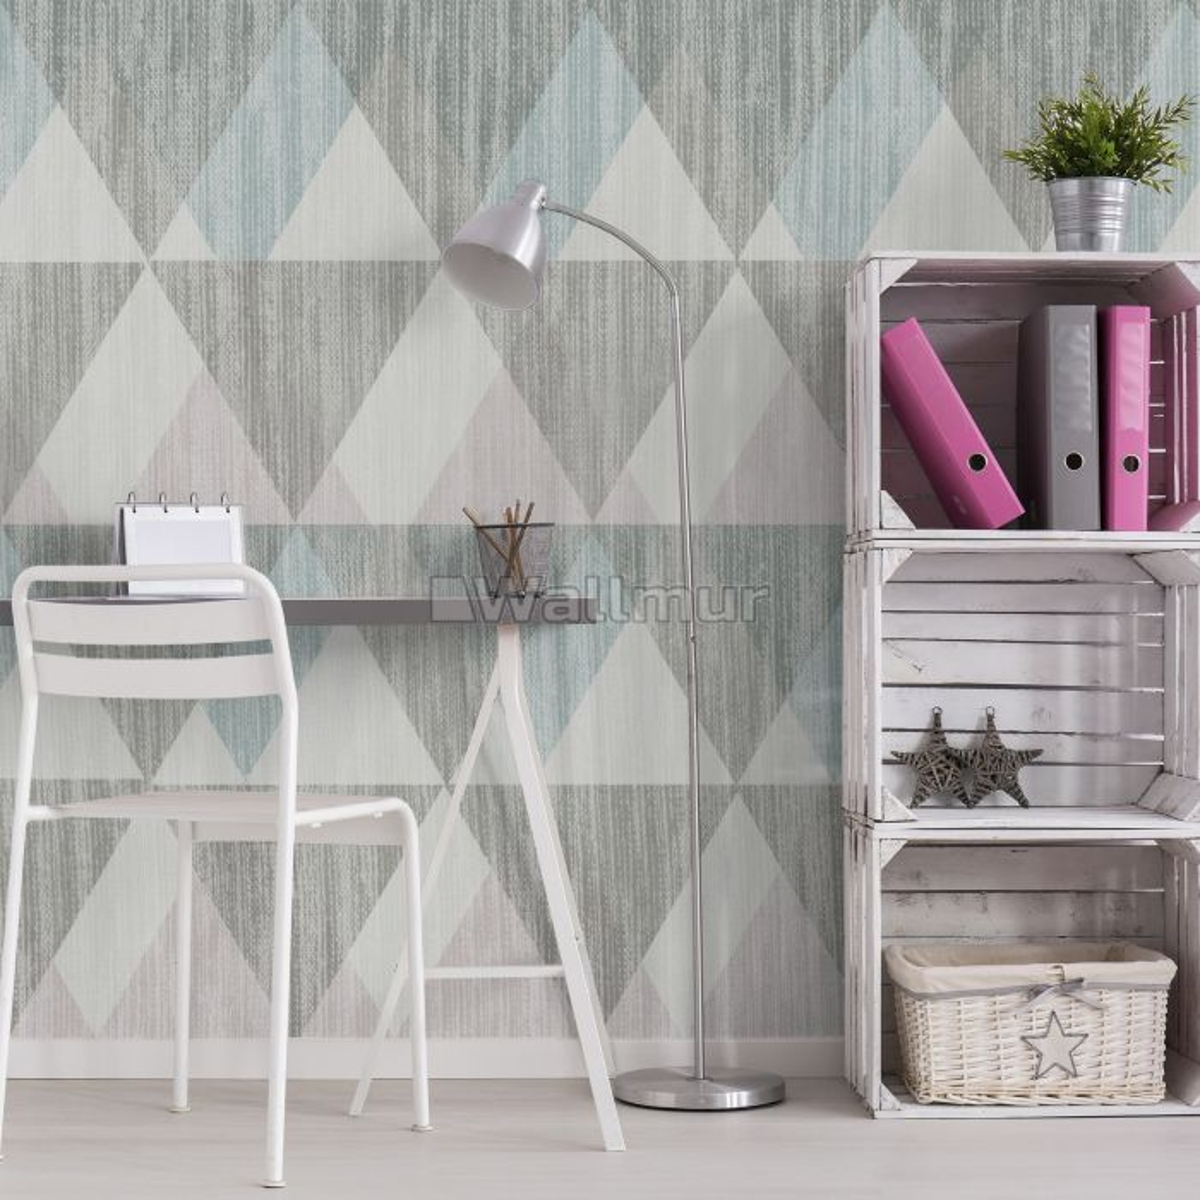 Trigon Geometric Shape Pattern Wallpaper Mural